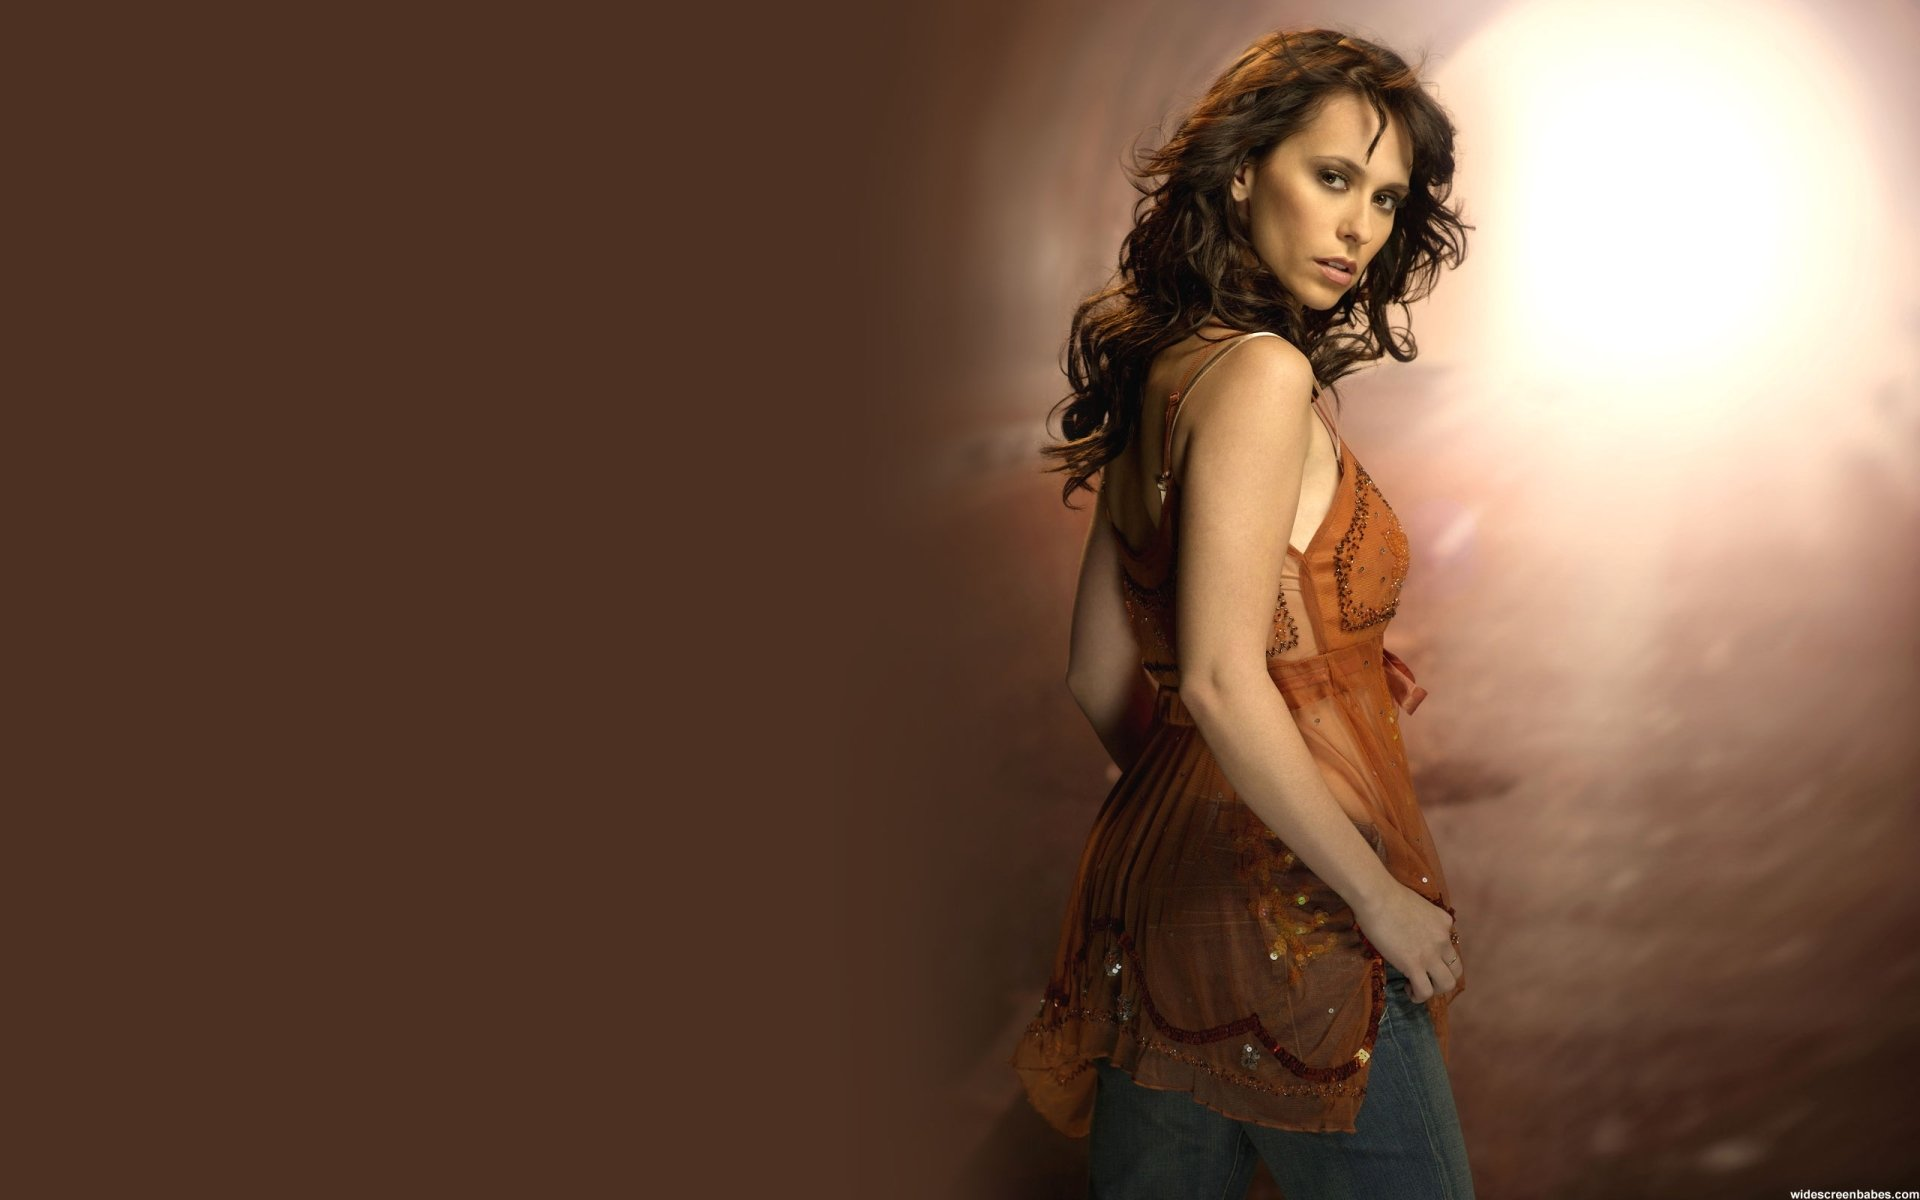 Wallpaper Hd Jennifer Love Hewitt : Jennifer Love Hewitt Full HD Wallpaper and Background 2560x1600 ID:114418